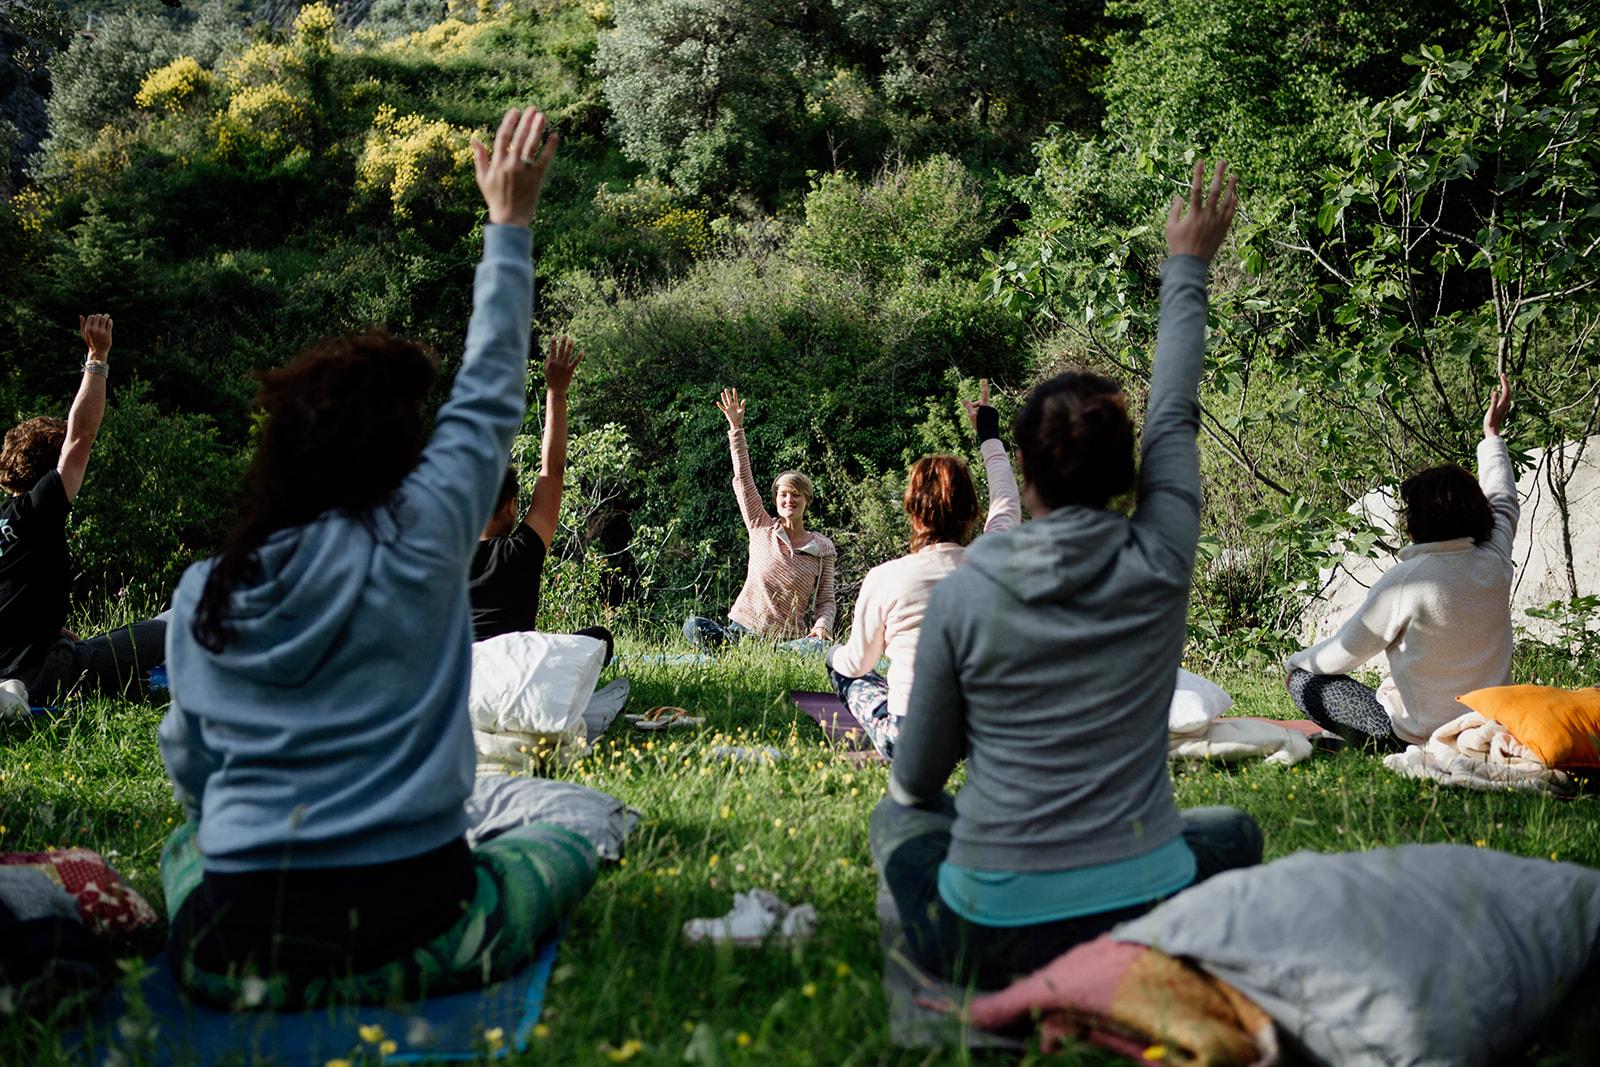 seated yoga outside on grass - hiking yoga holiday montenegro